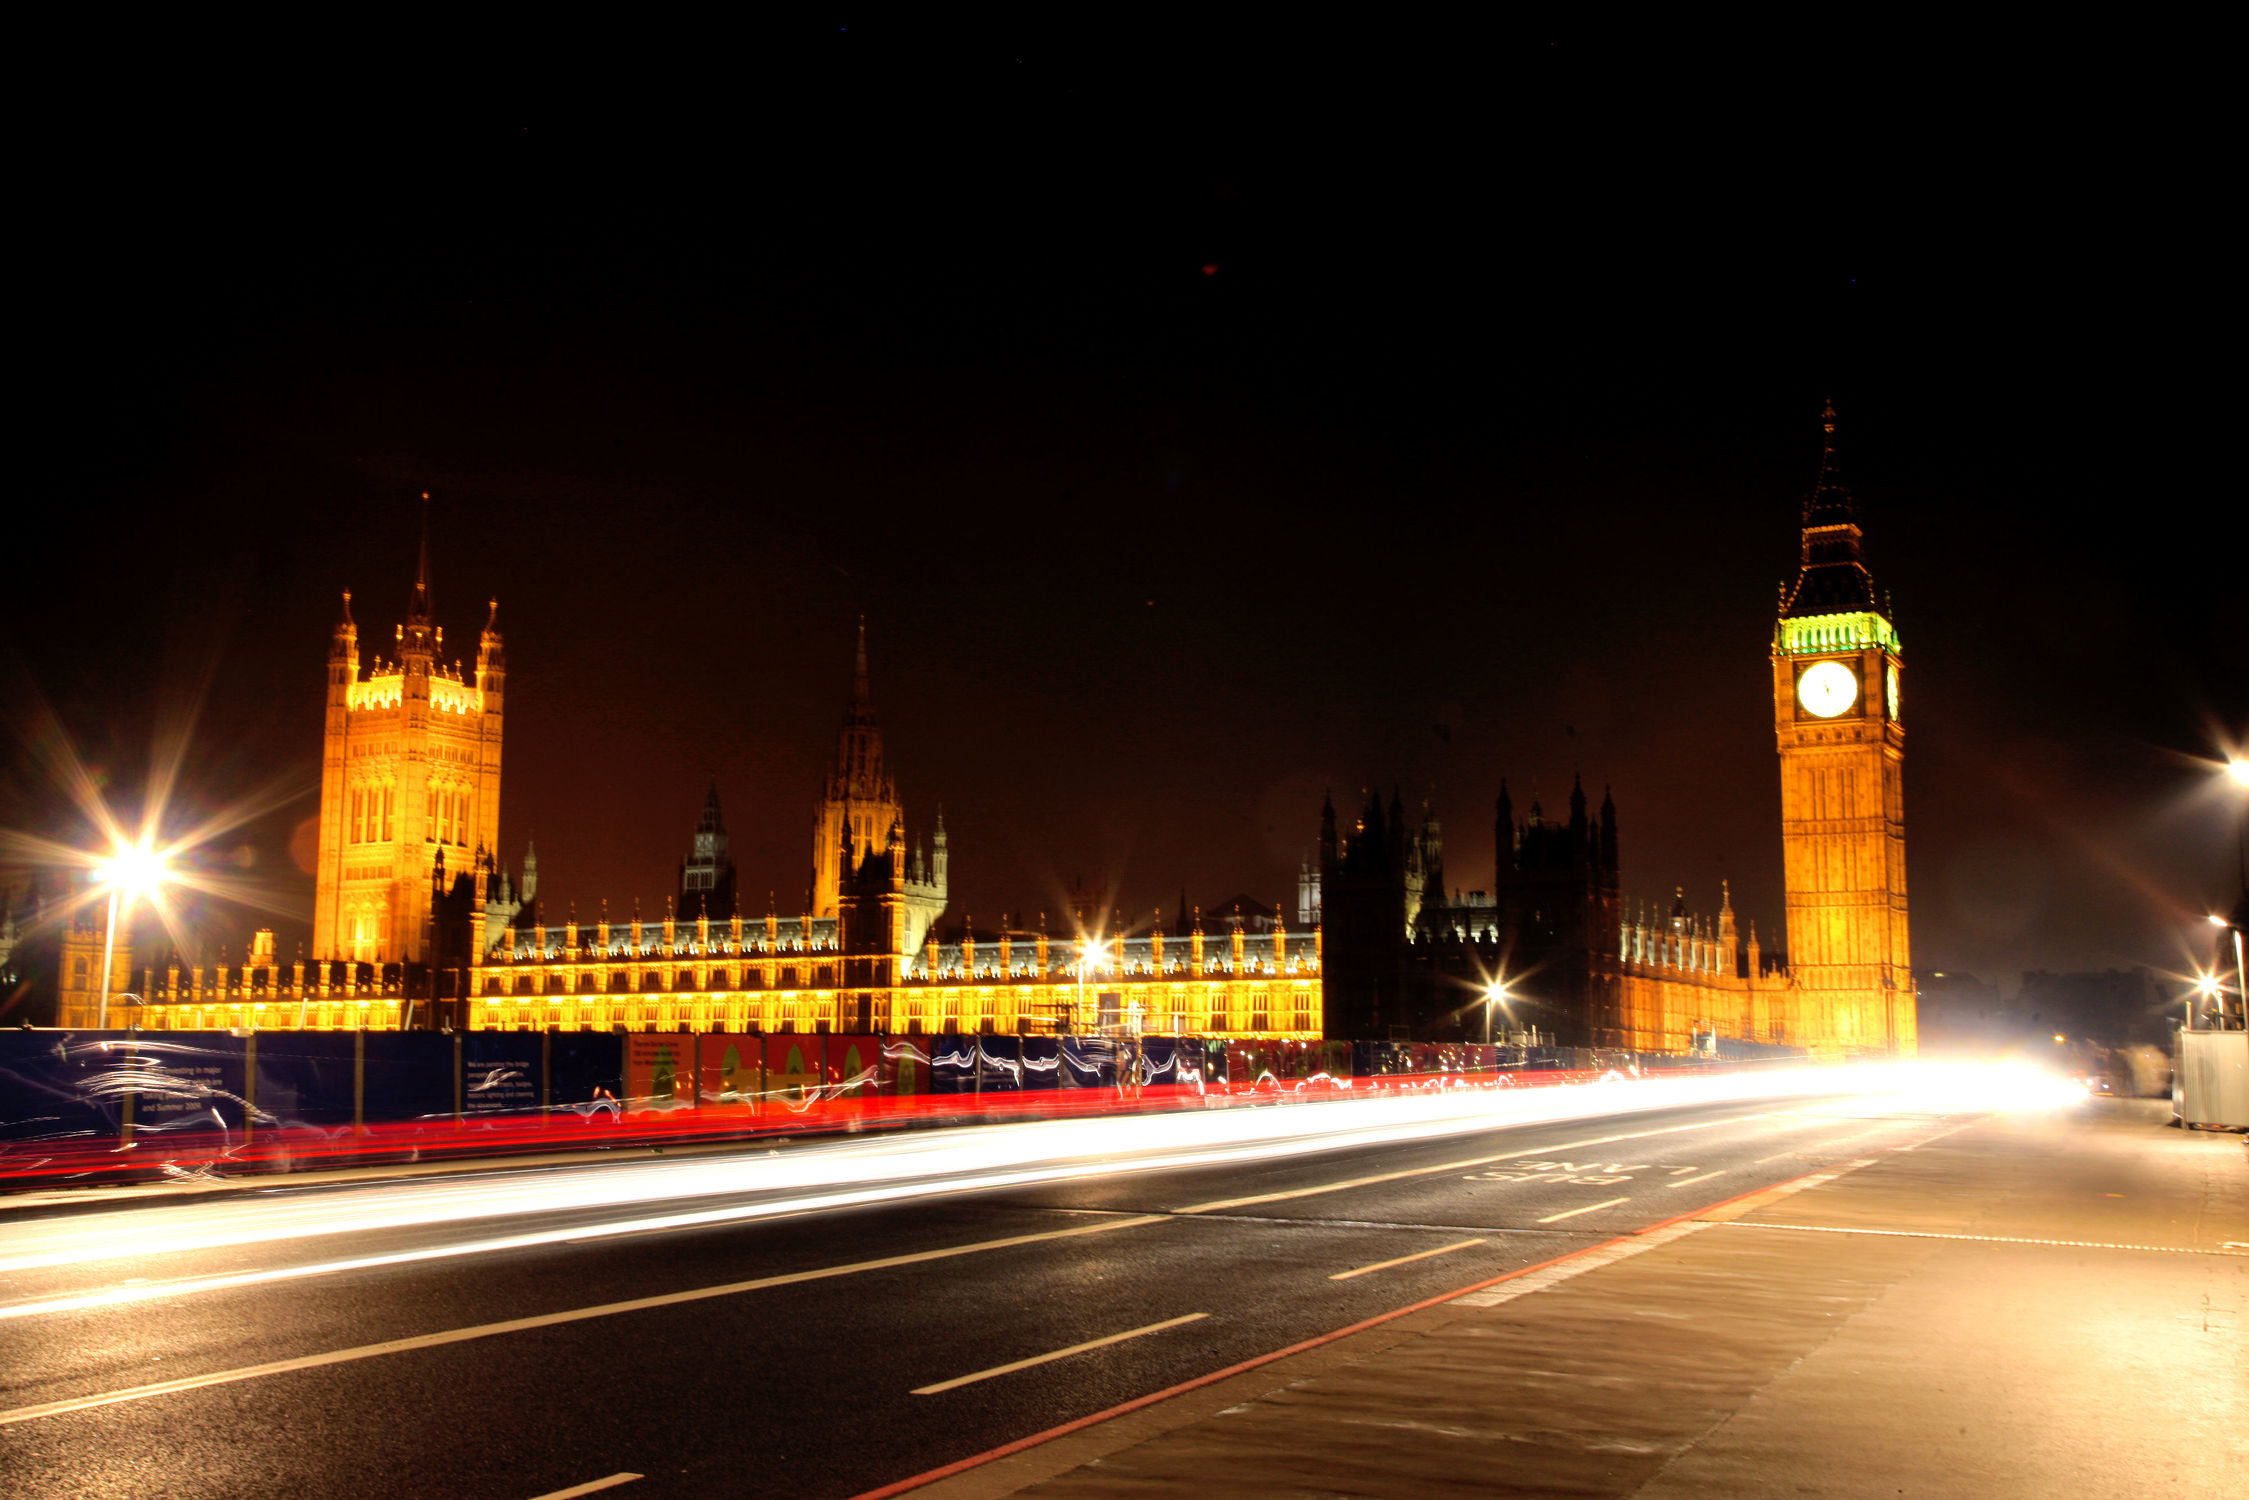 Bild mit Big Ben, Städte, England, London, Stadt, City of London, City, Nacht, Stadtleben